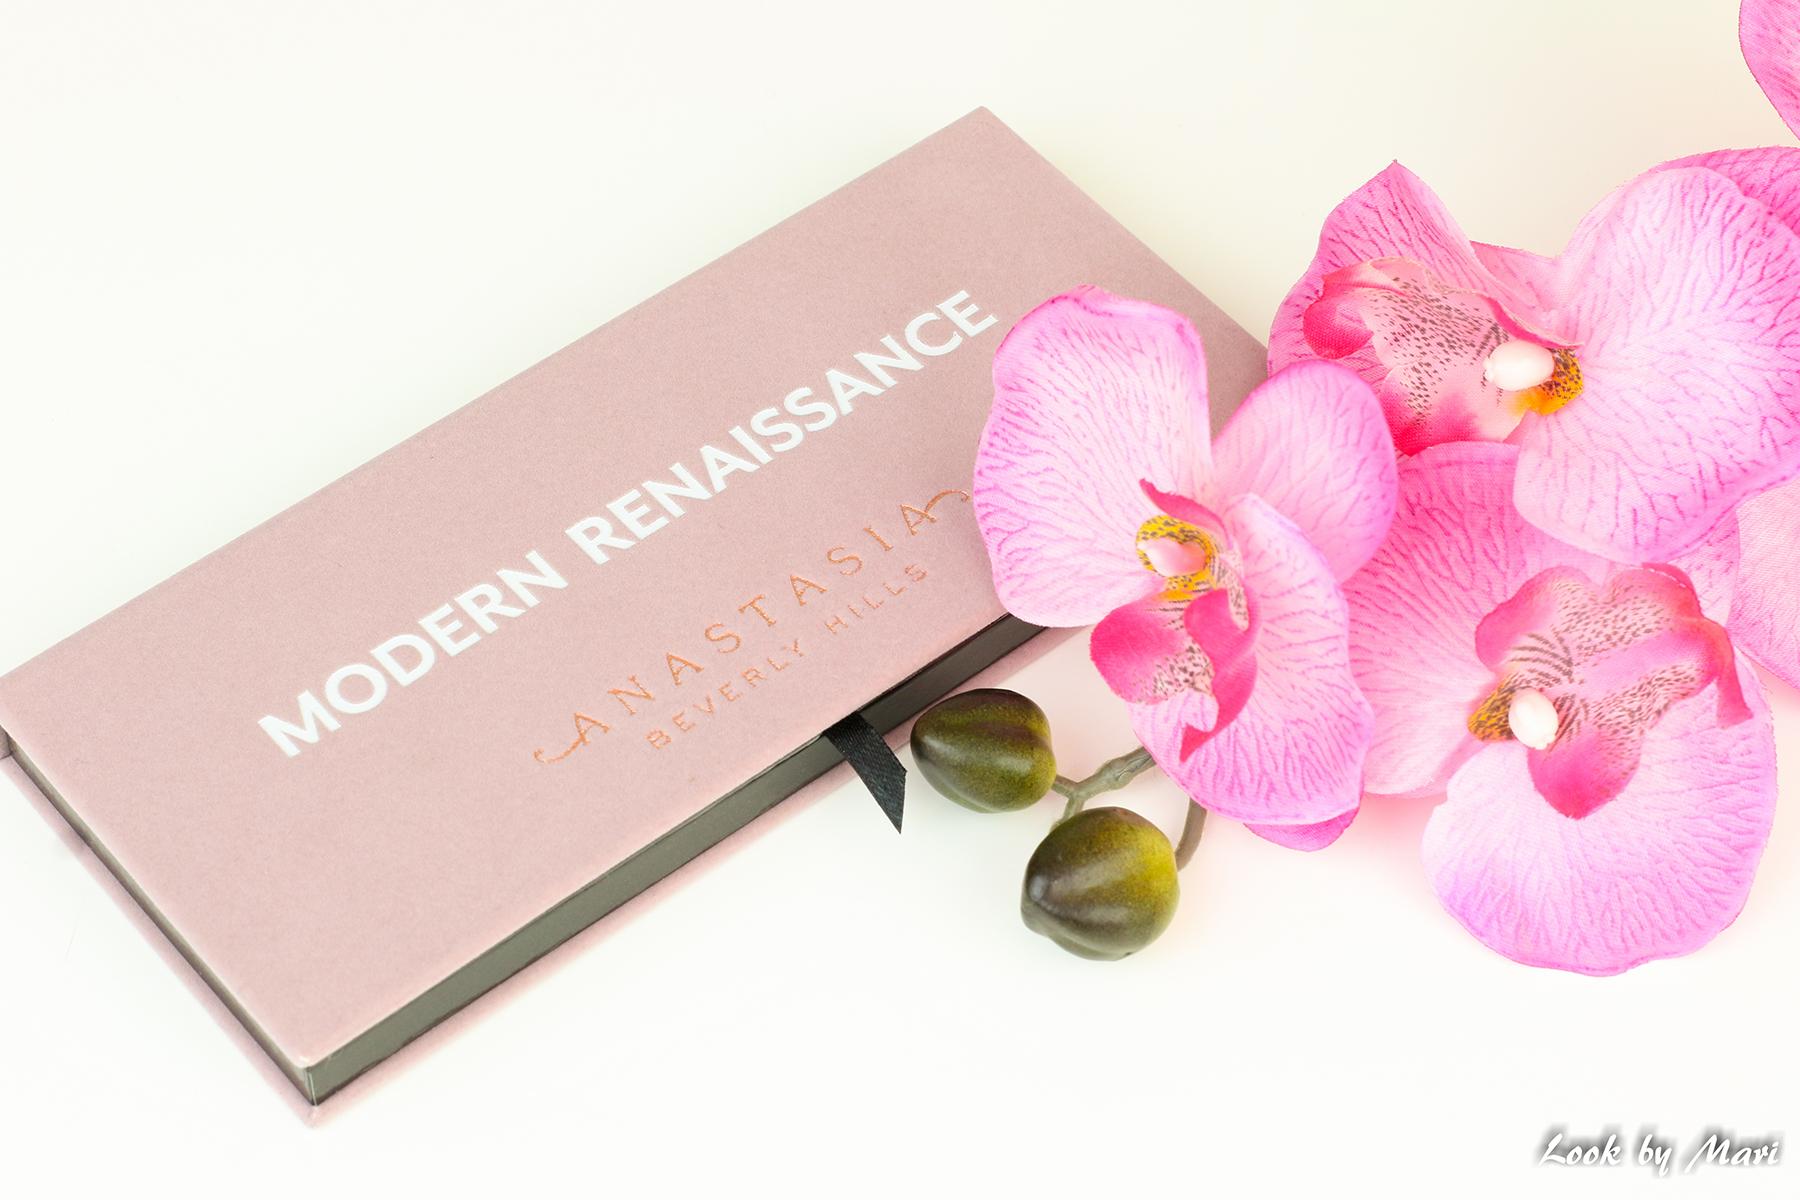 2 ANASTASIA BEVERLY HILLS modern renaissance palette review